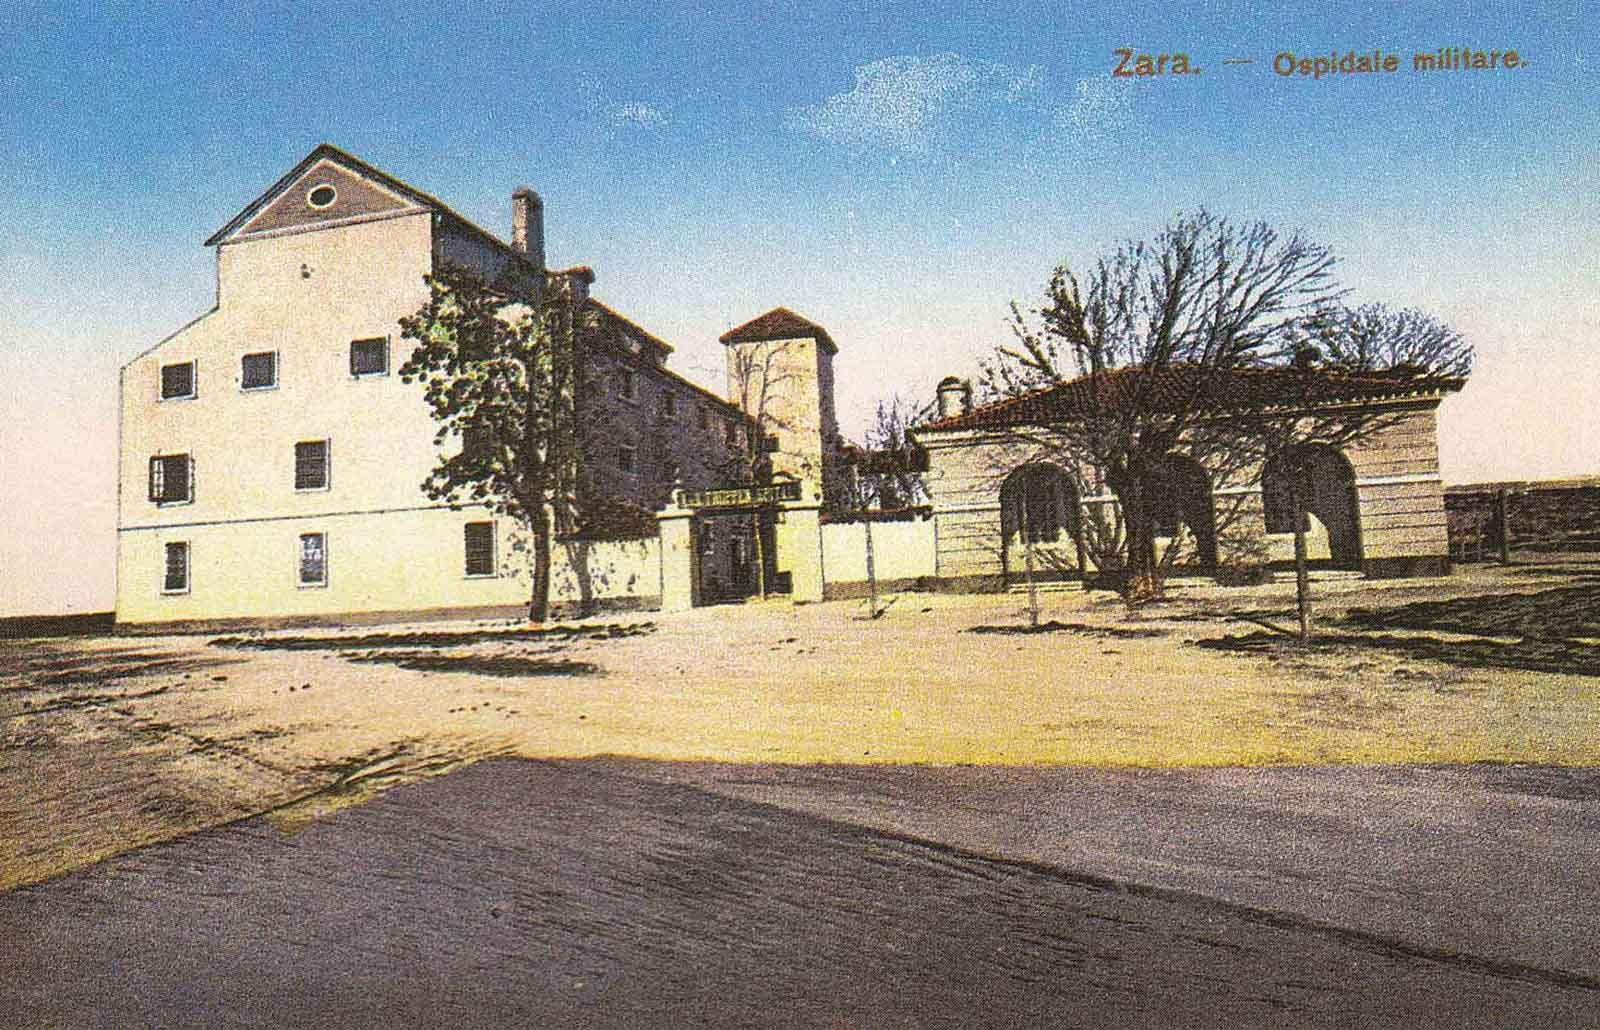 Monastery St Nicholas Military hospital